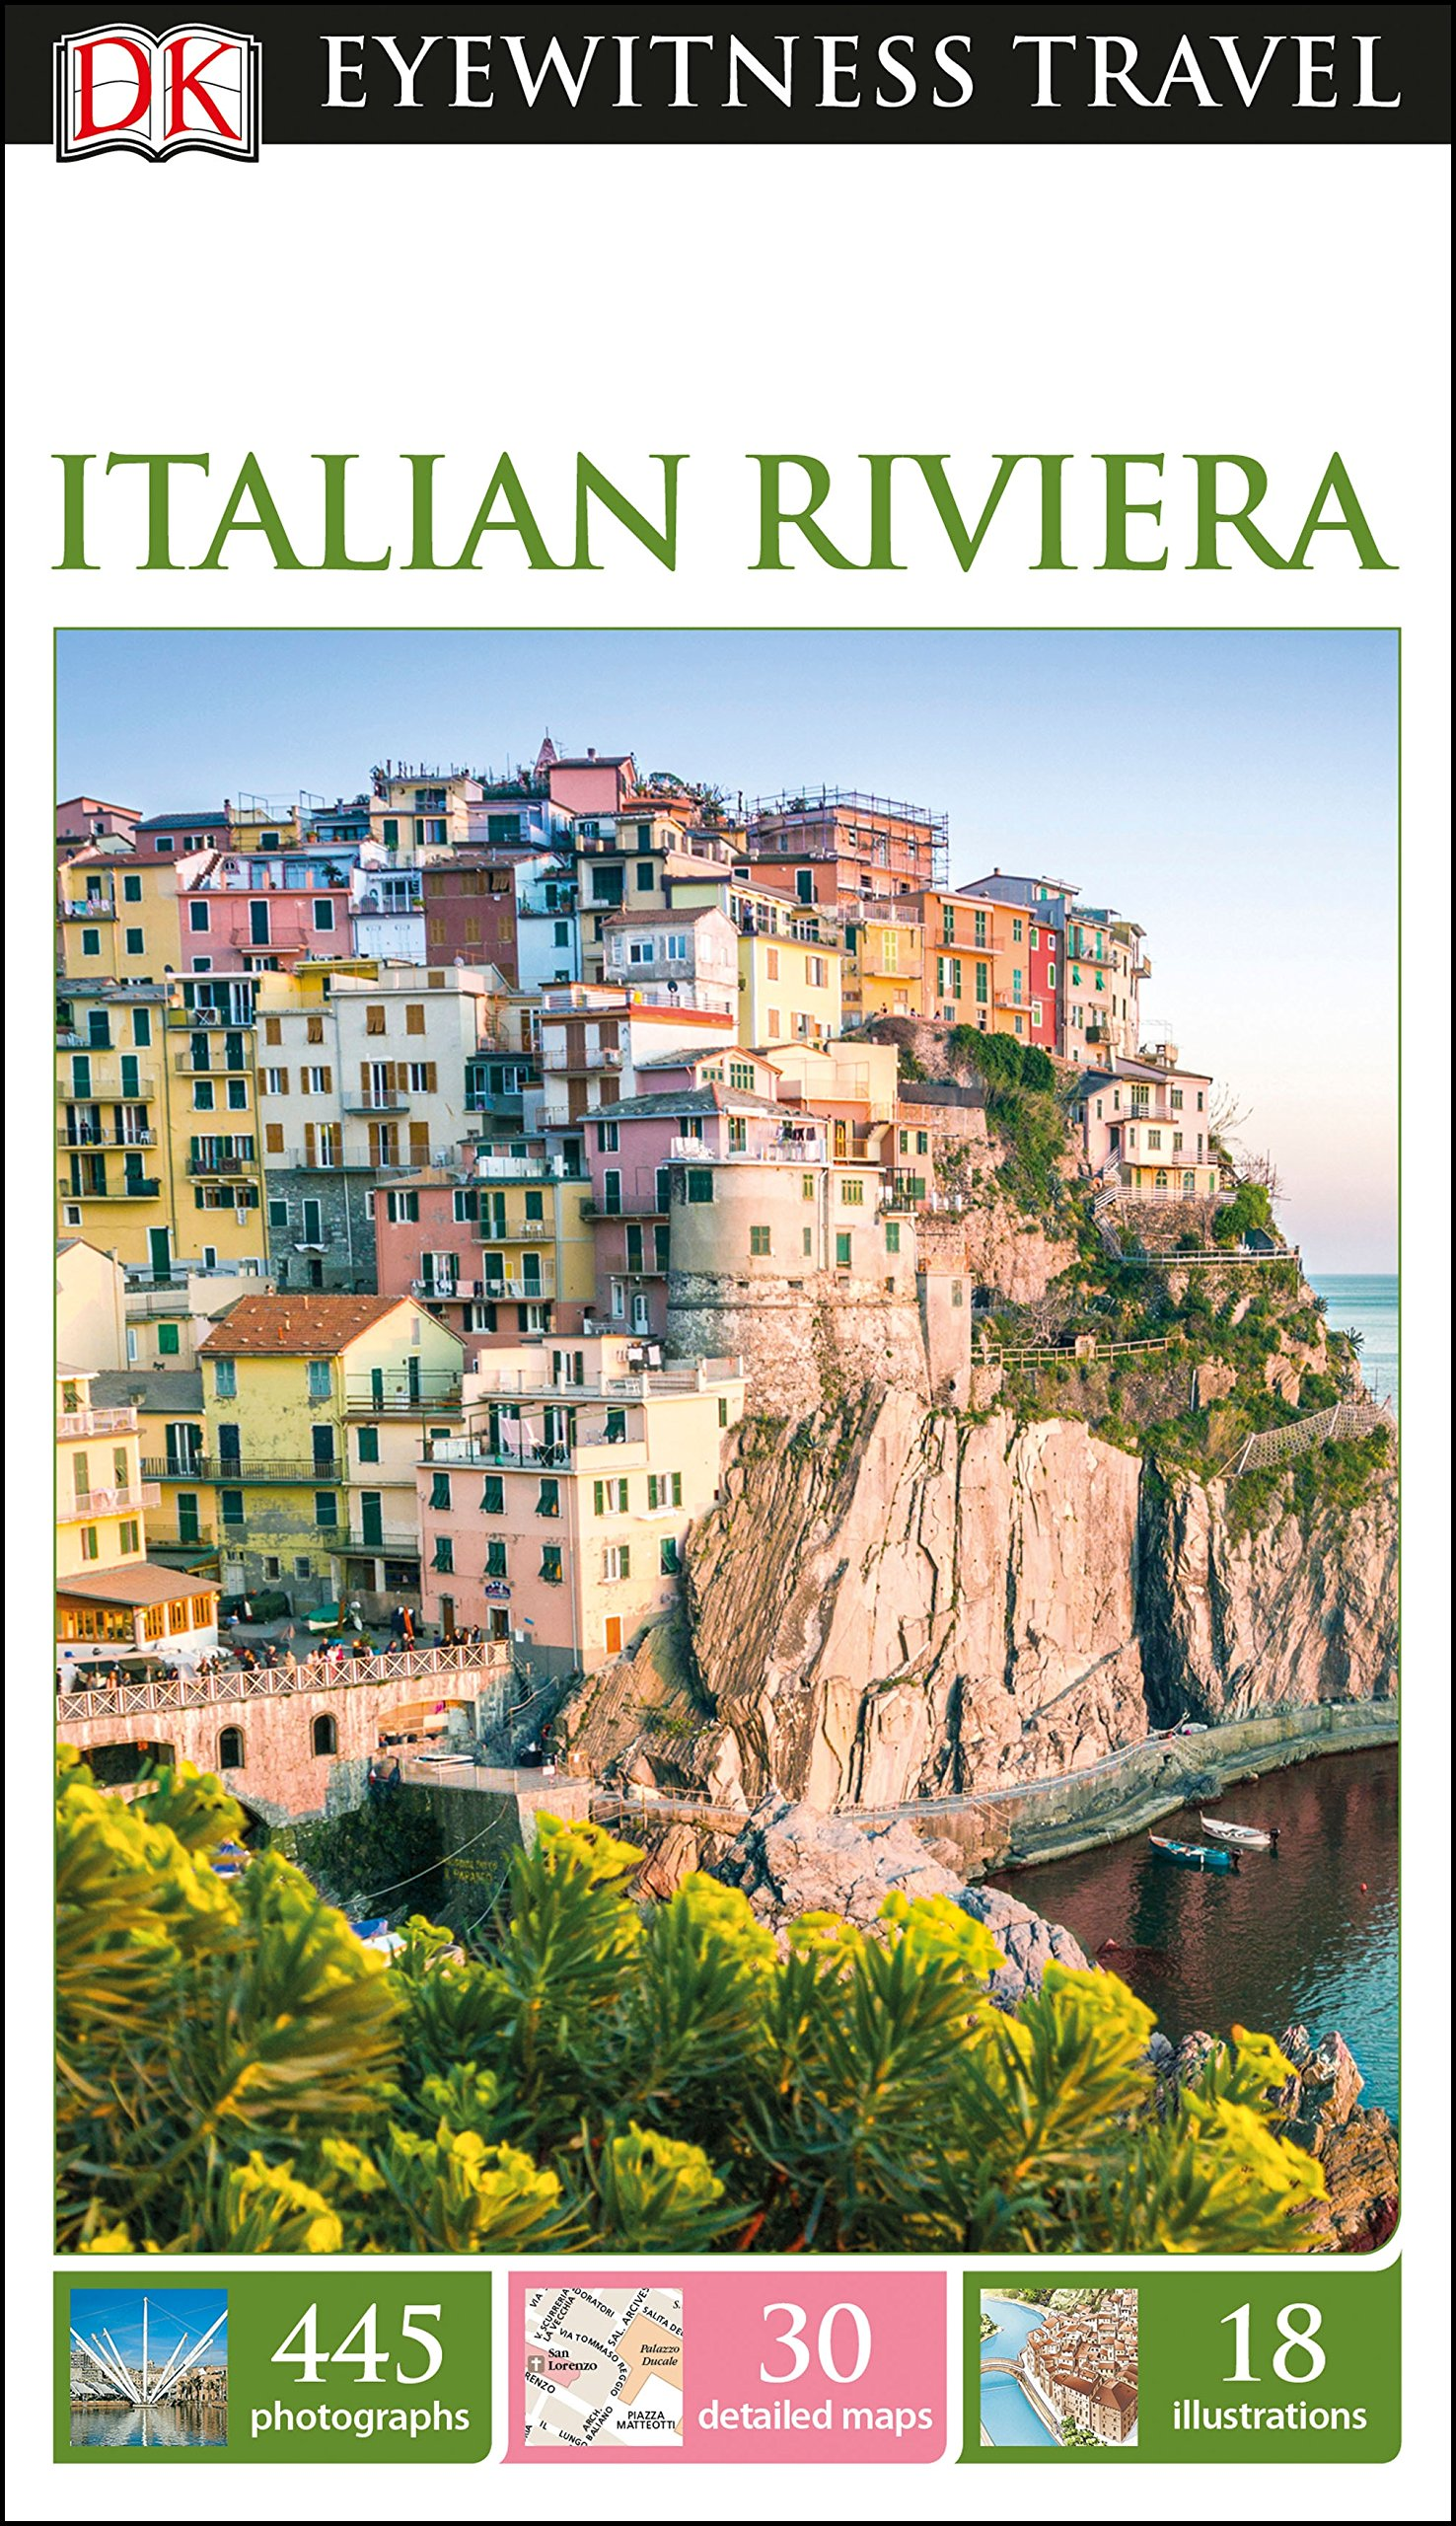 dk-eyewitness-travel-guide-italian-riviera-eyewitness-travel-guides